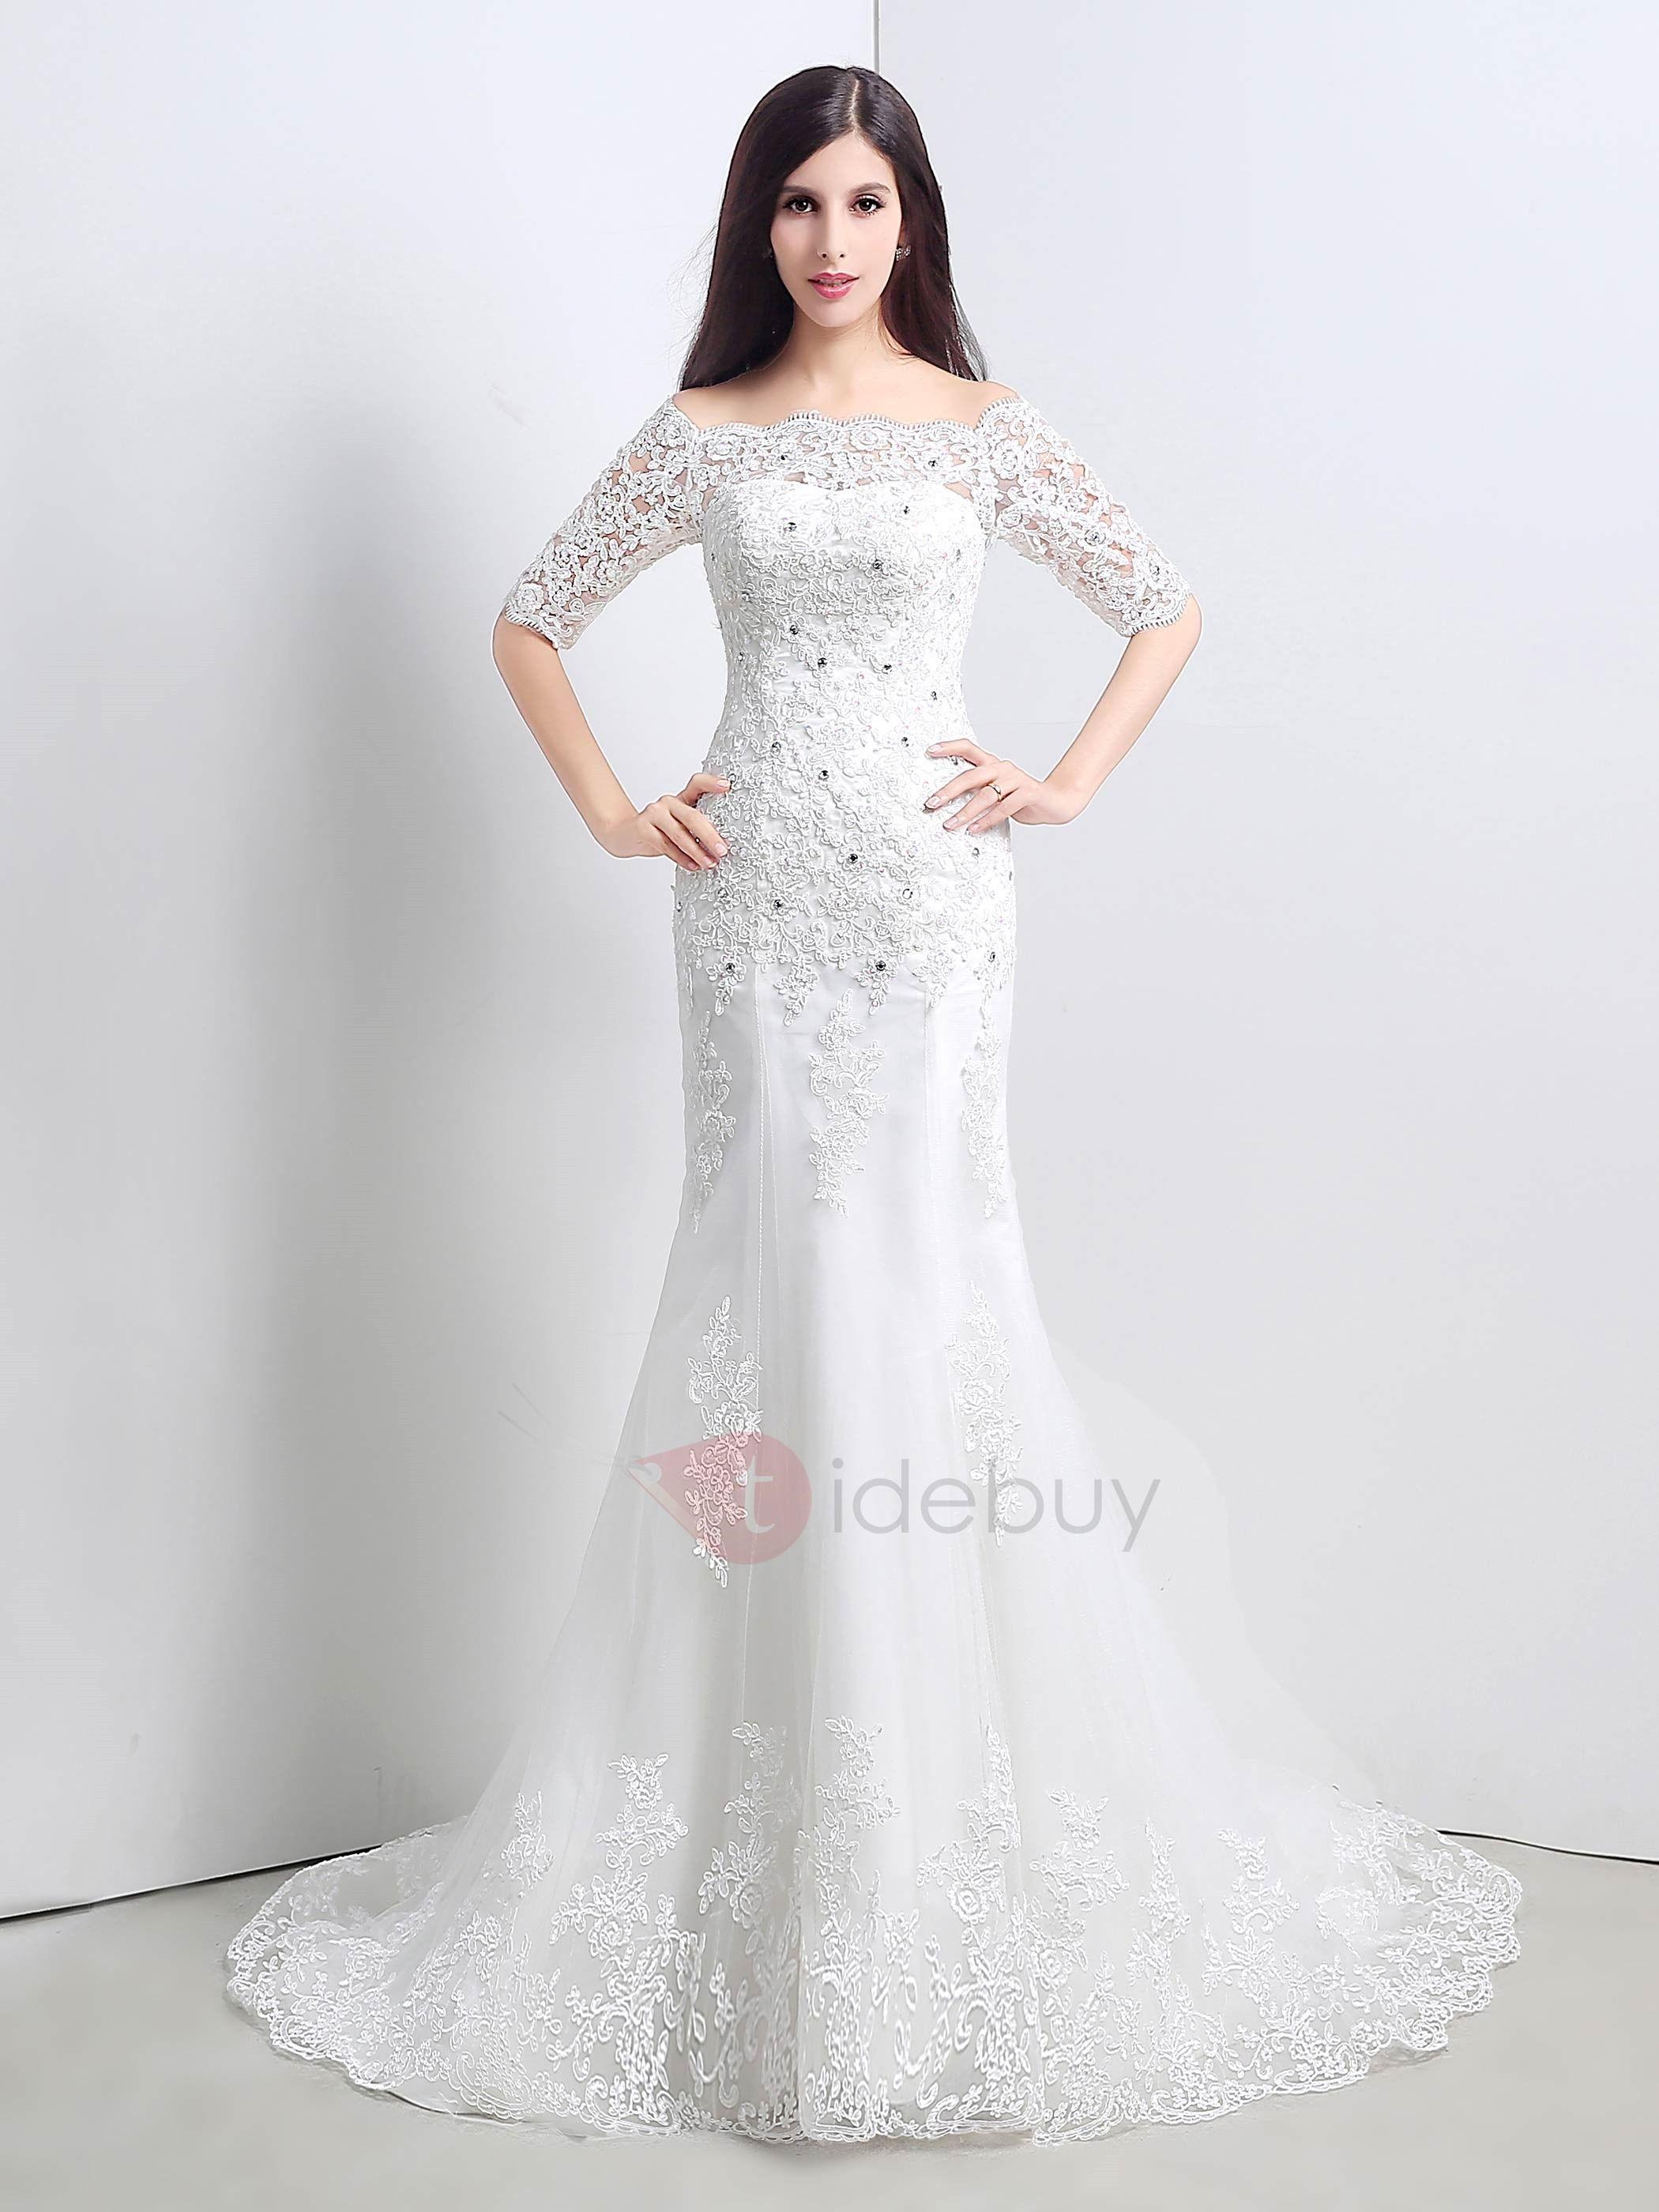 White mermaid wedding dress  Off the Shoulder Beading Appliques Mermaid Wedding Dress with Half